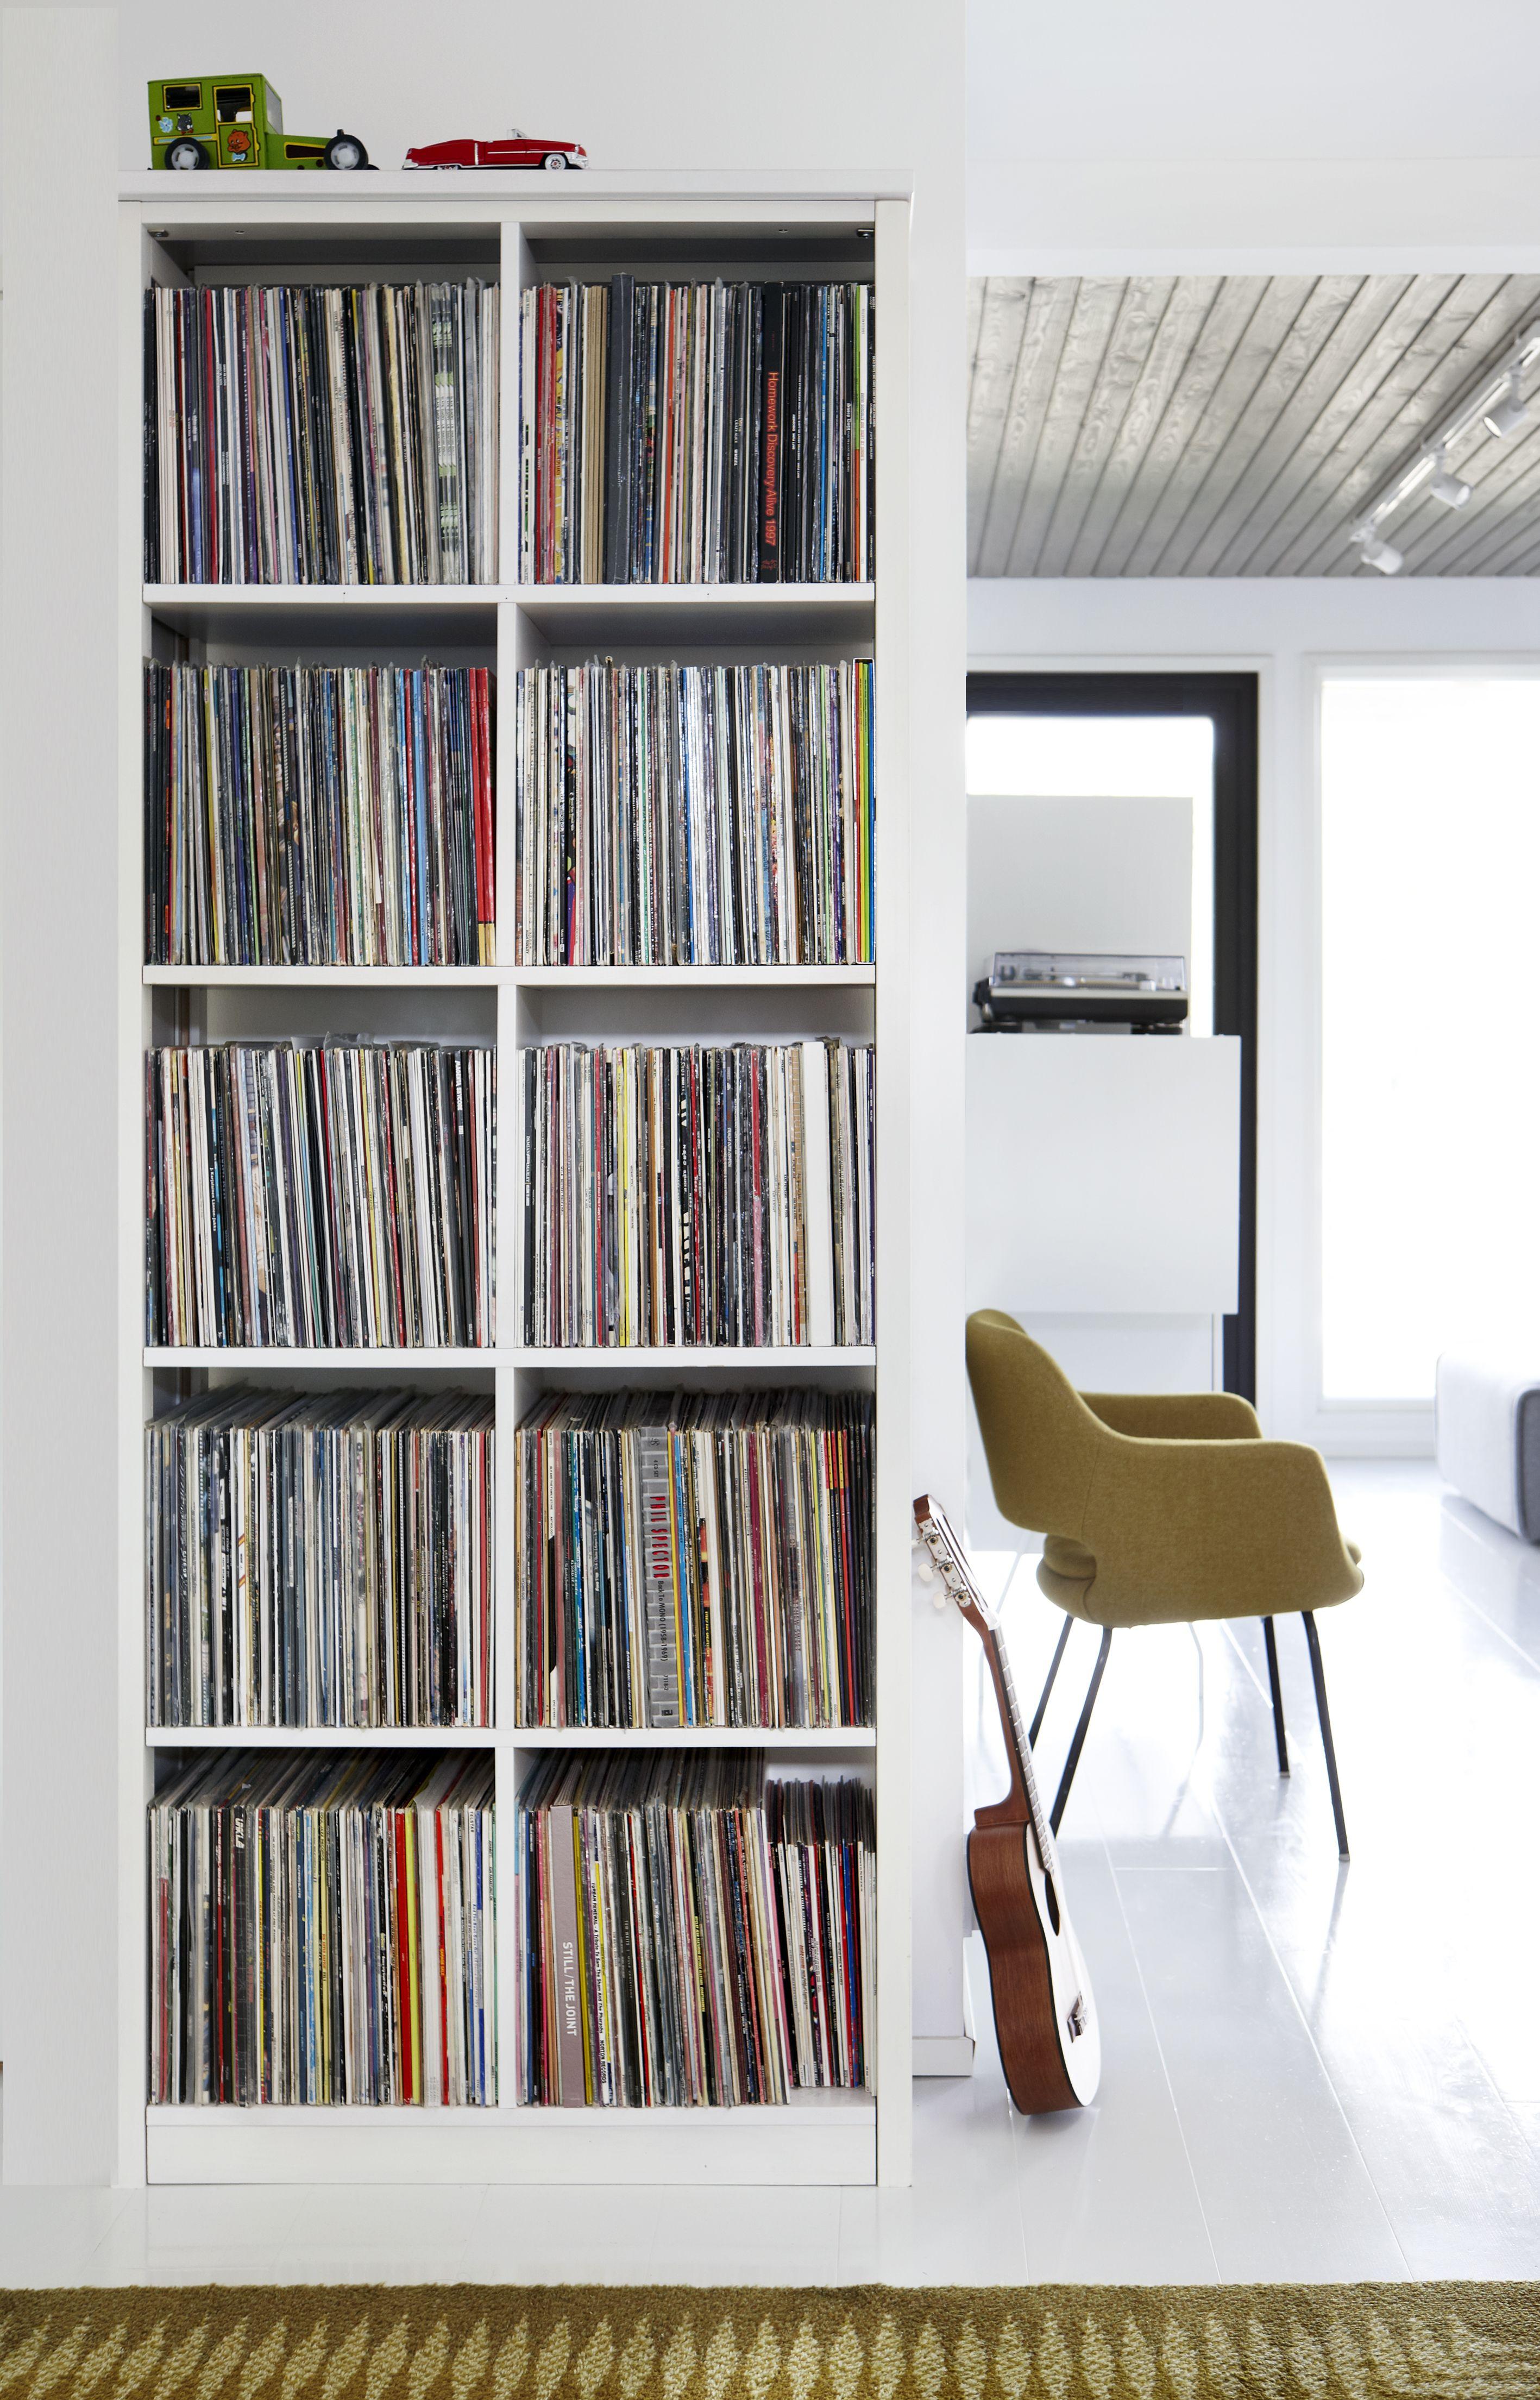 player tkmk record vinyl lp w console fullxfull shelf il storage listing